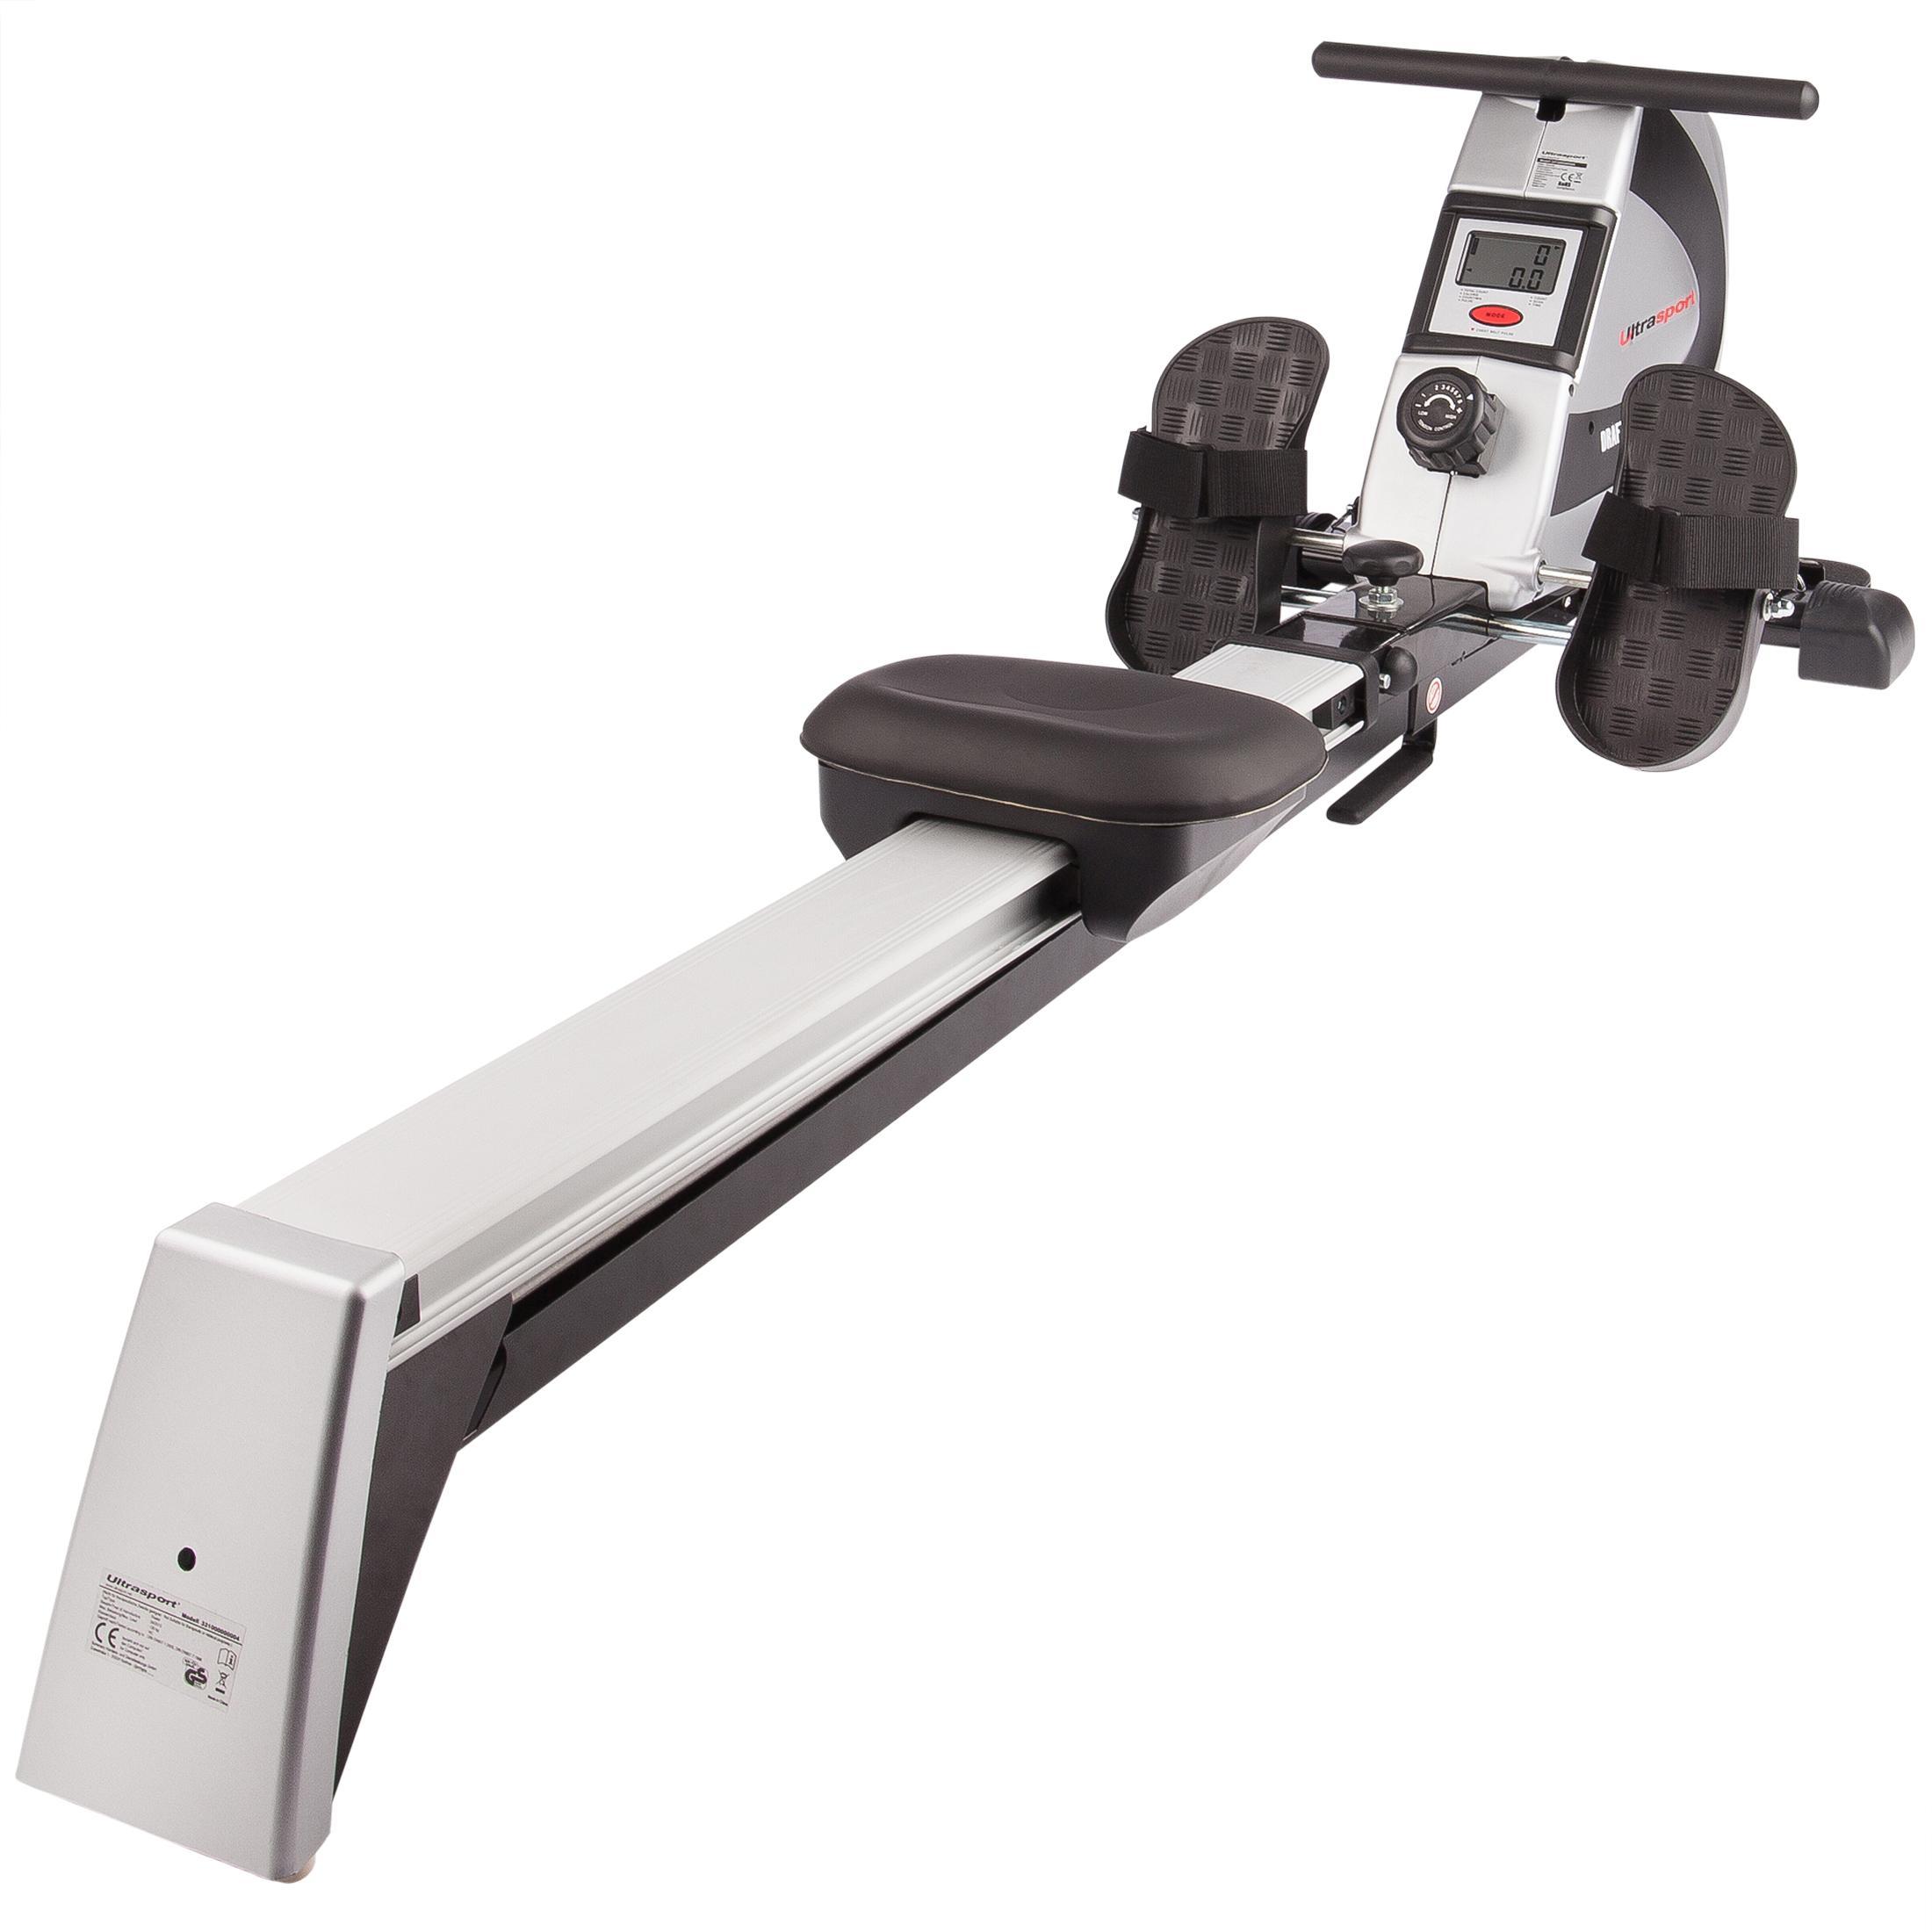 Ultrasport Drafter 550 Rowing Machine 2 In 1 Rowing